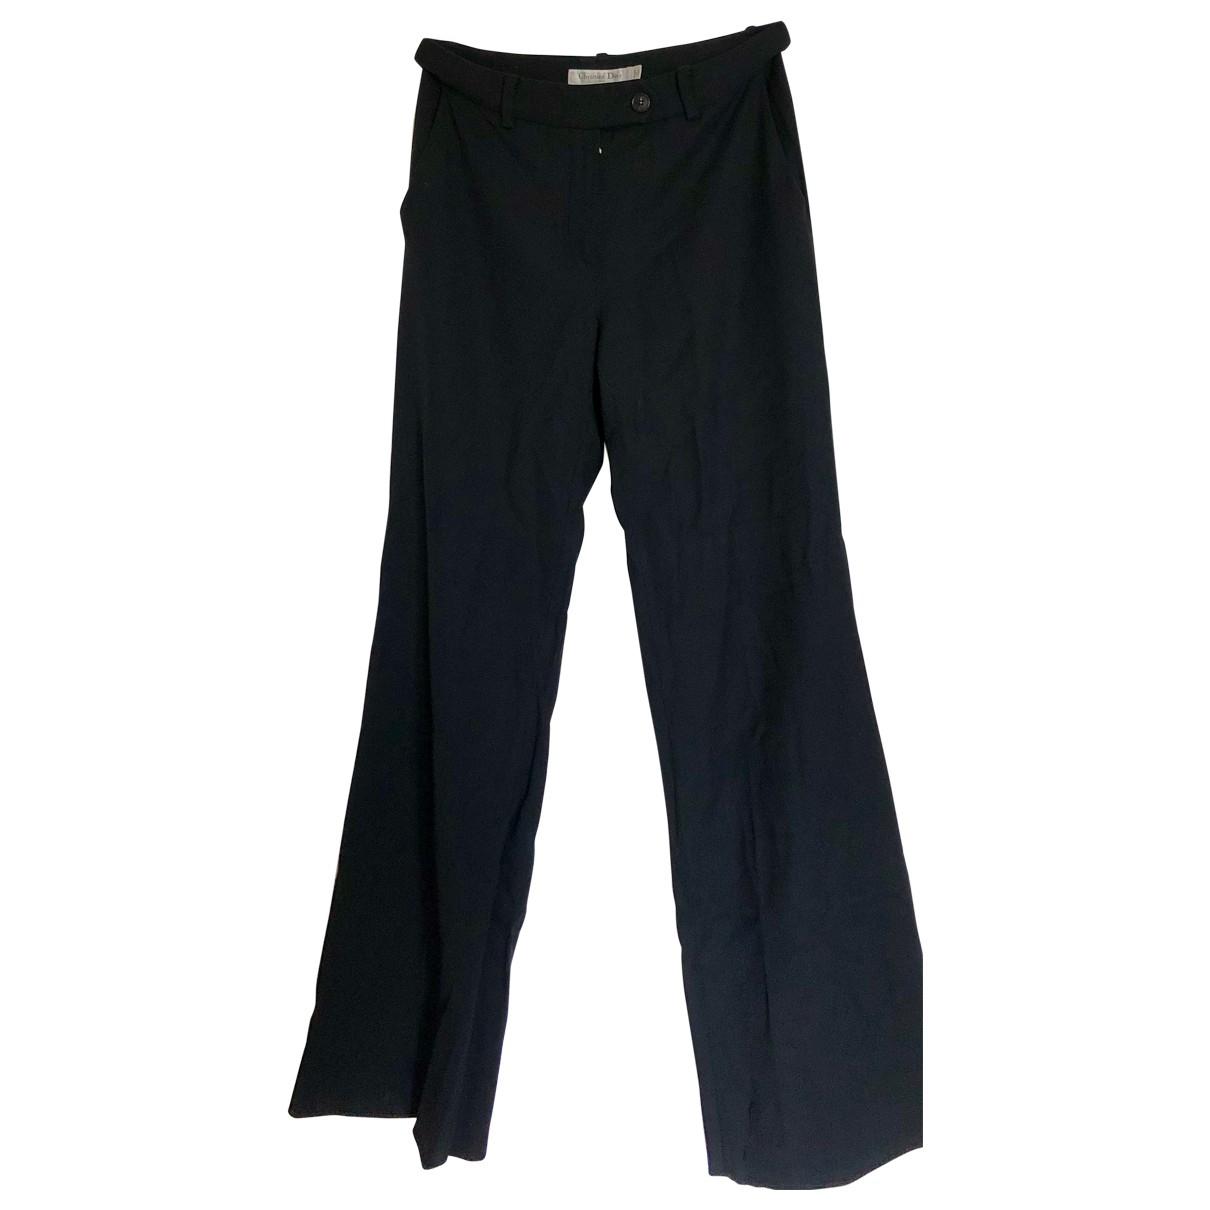 Dior \N Black Wool Trousers for Women 36 FR